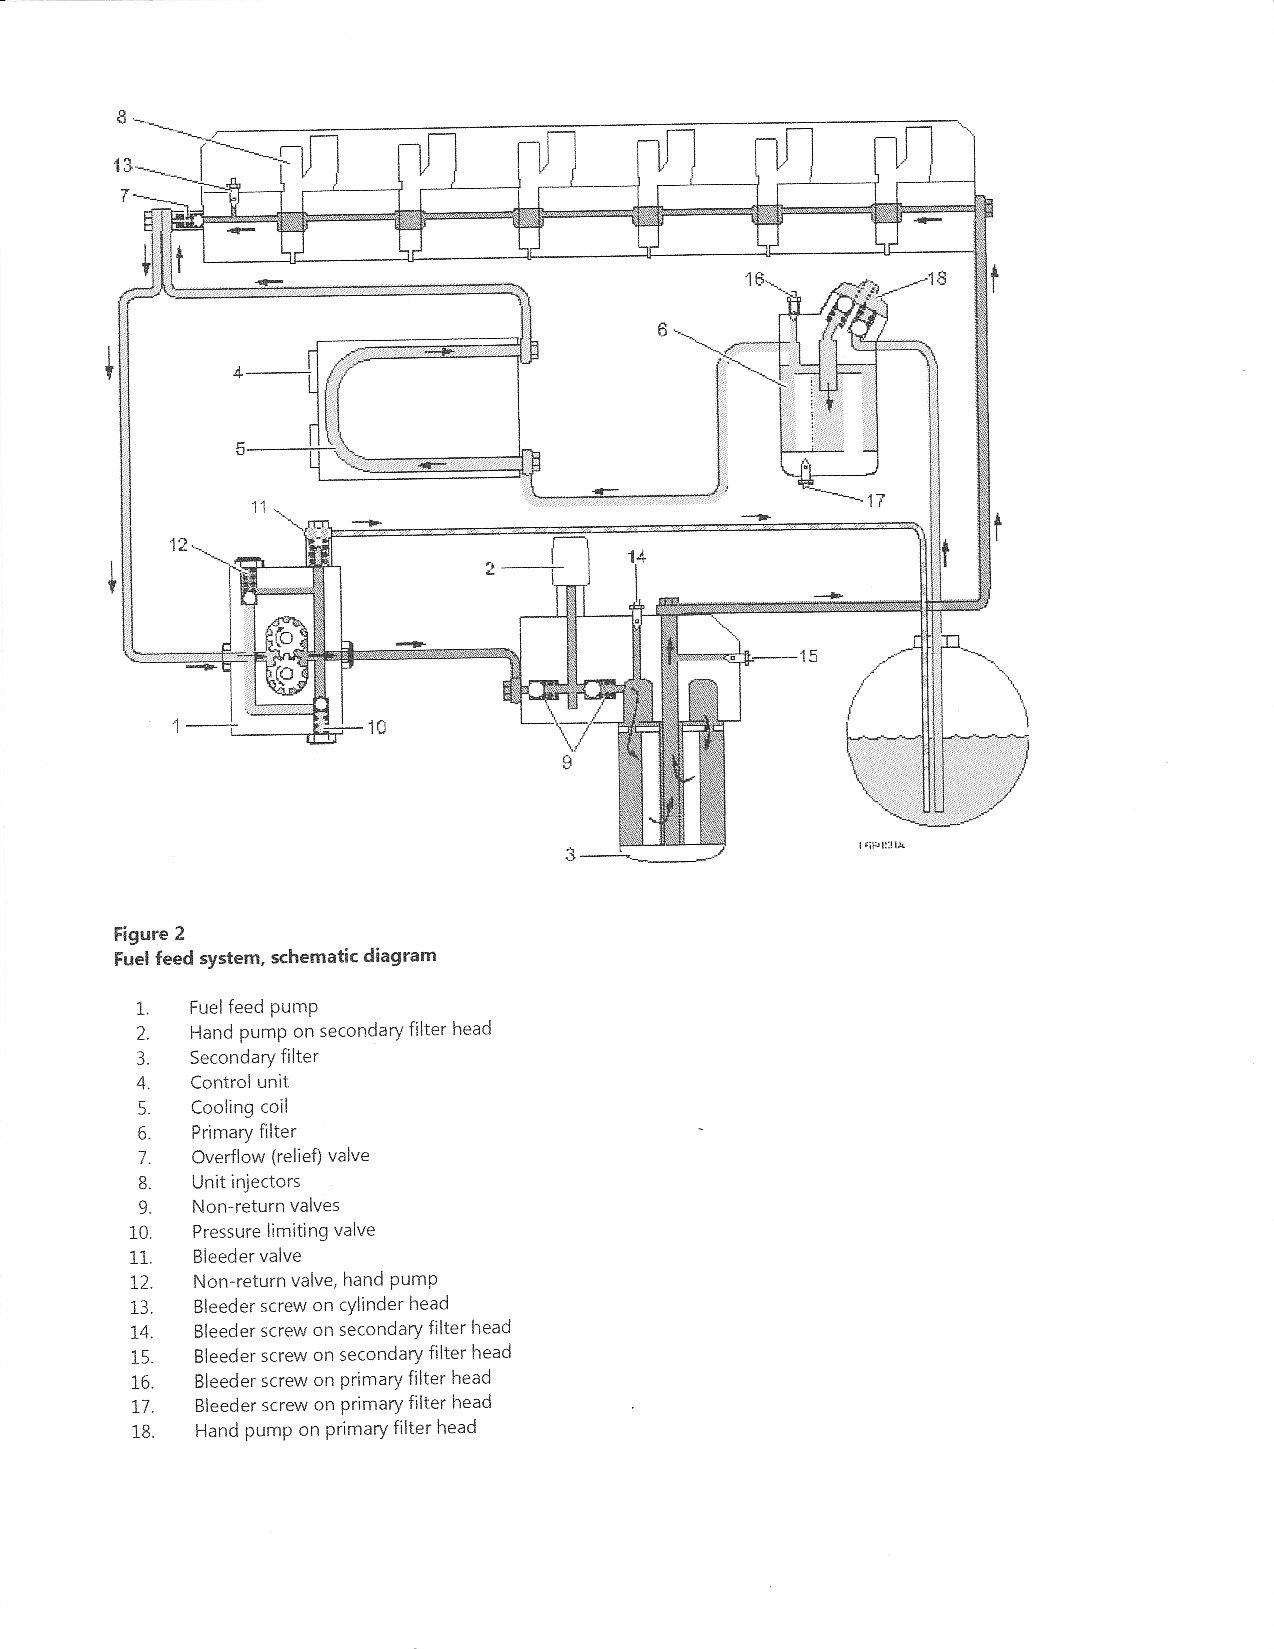 [DIAGRAM_5FD]  ND_5911] Volvo D12 Engine Diagram Air Valves Schematic Wiring | Volvo Vnl Truck Wiring Diagrams Low Air |  | Pendu Feren Getap Bepta Mohammedshrine Librar Wiring 101